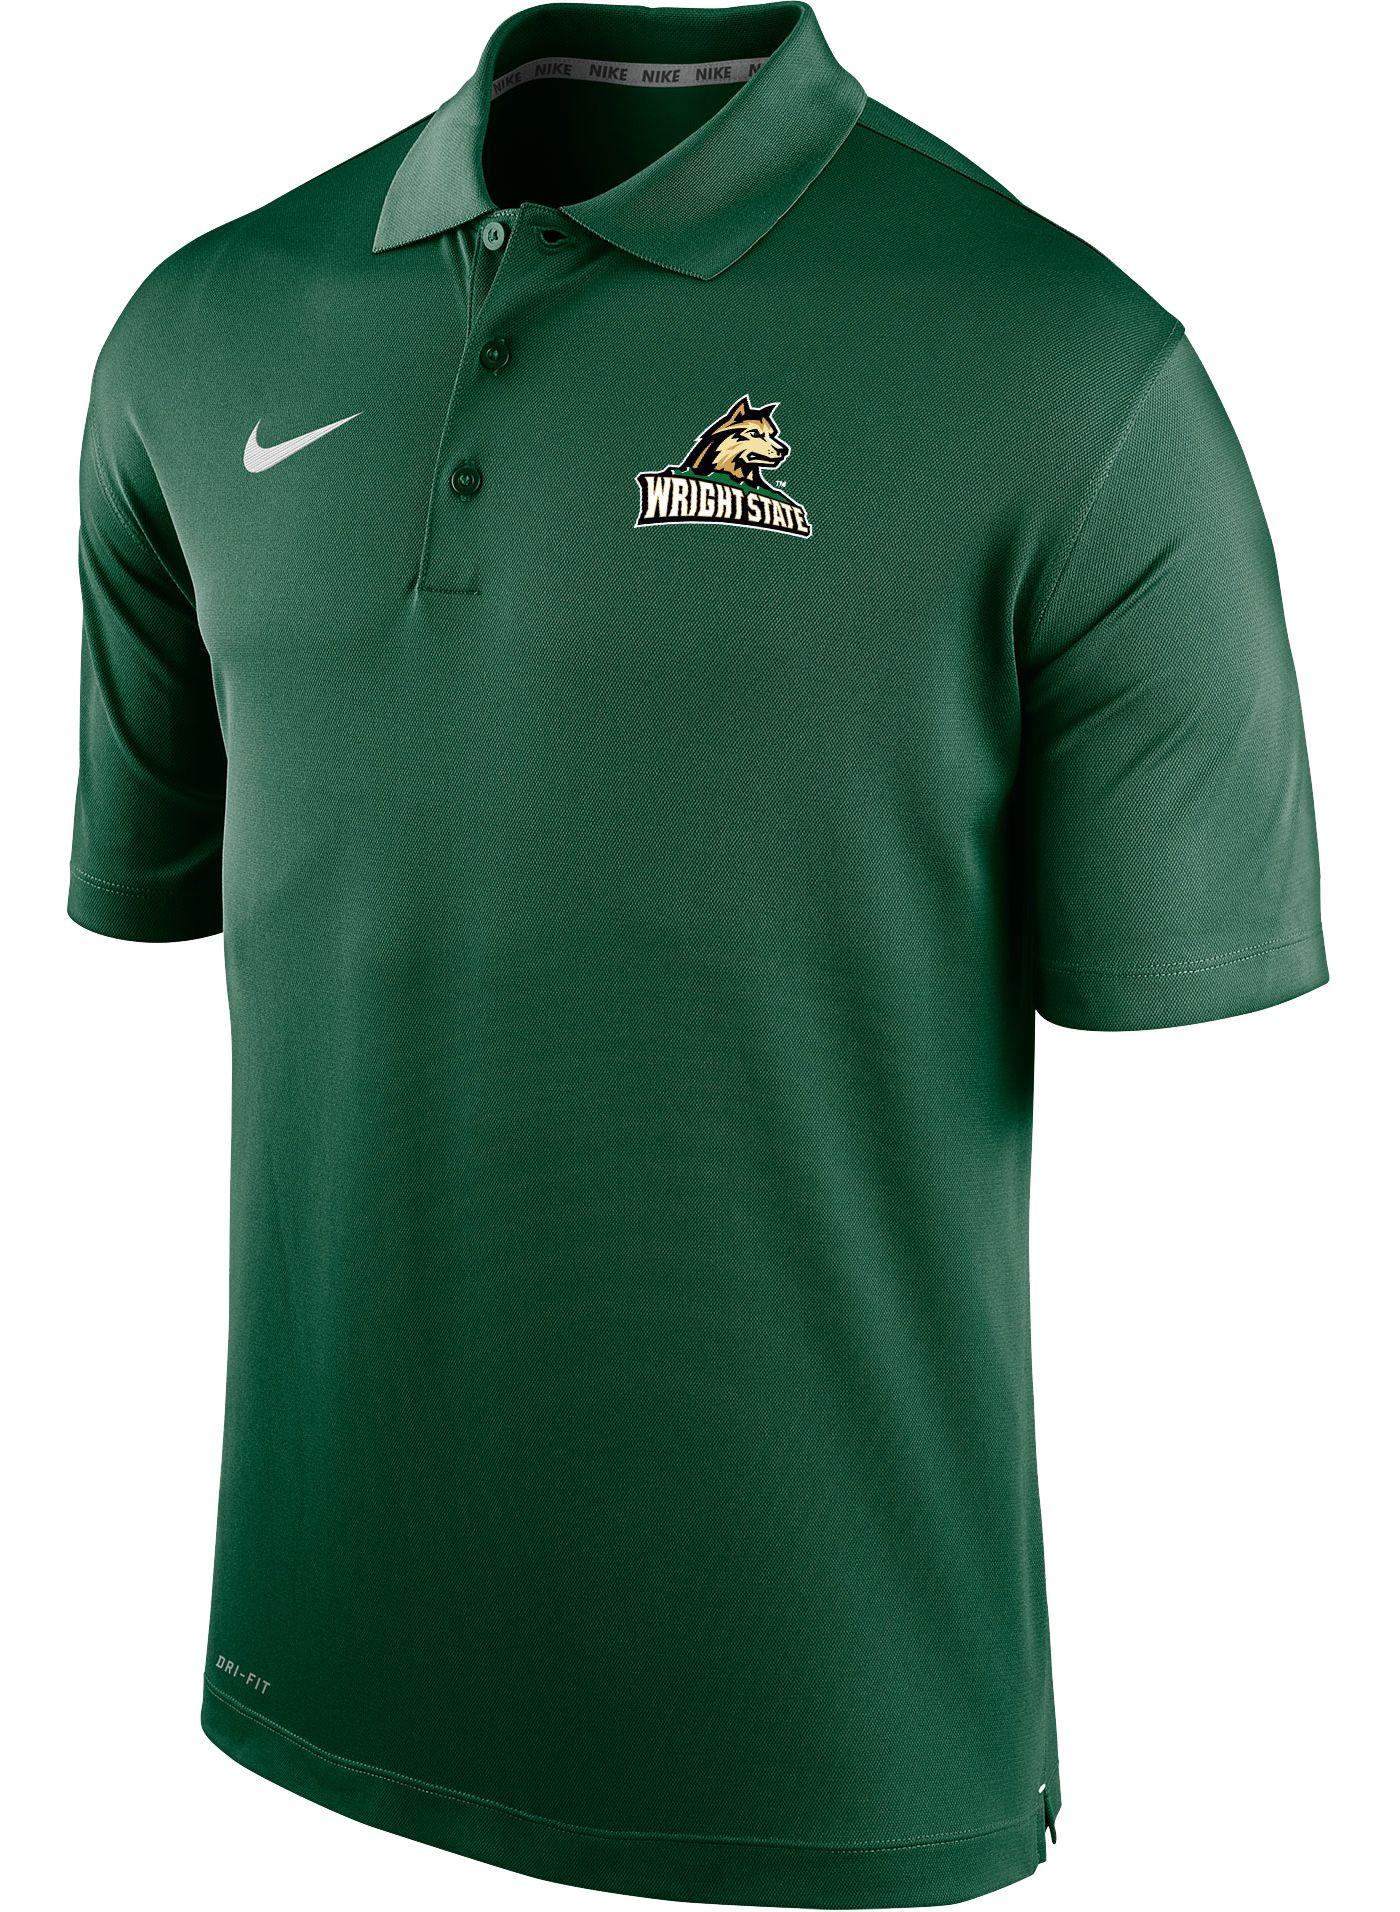 Nike Men's Wright State Raiders Green Varsity Polo